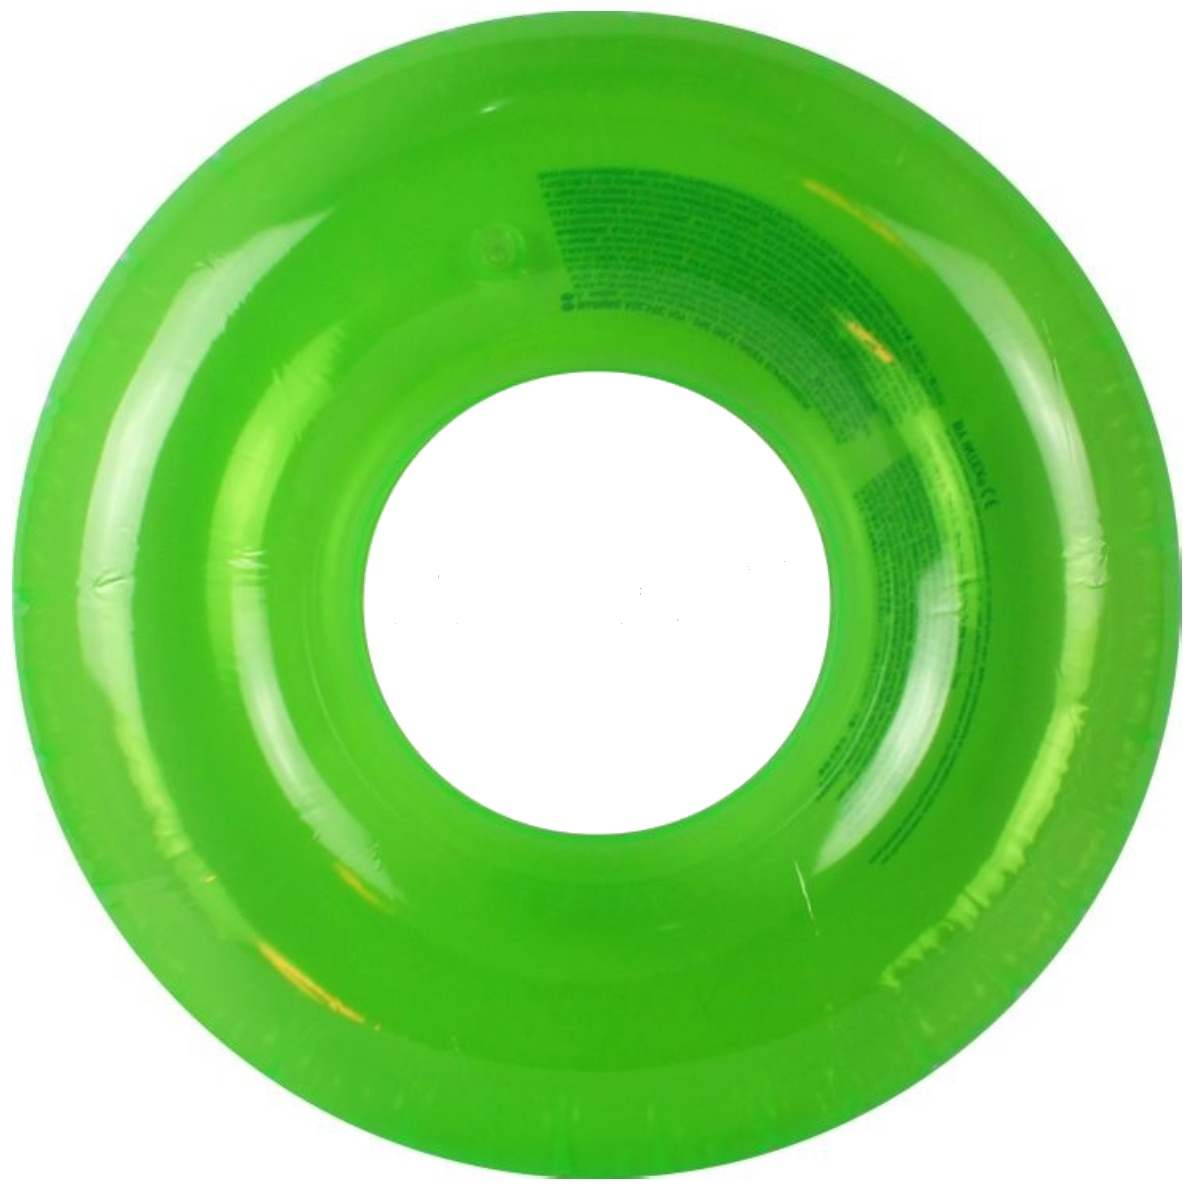 Nafukovací kruh barevný 76 cm - zelený